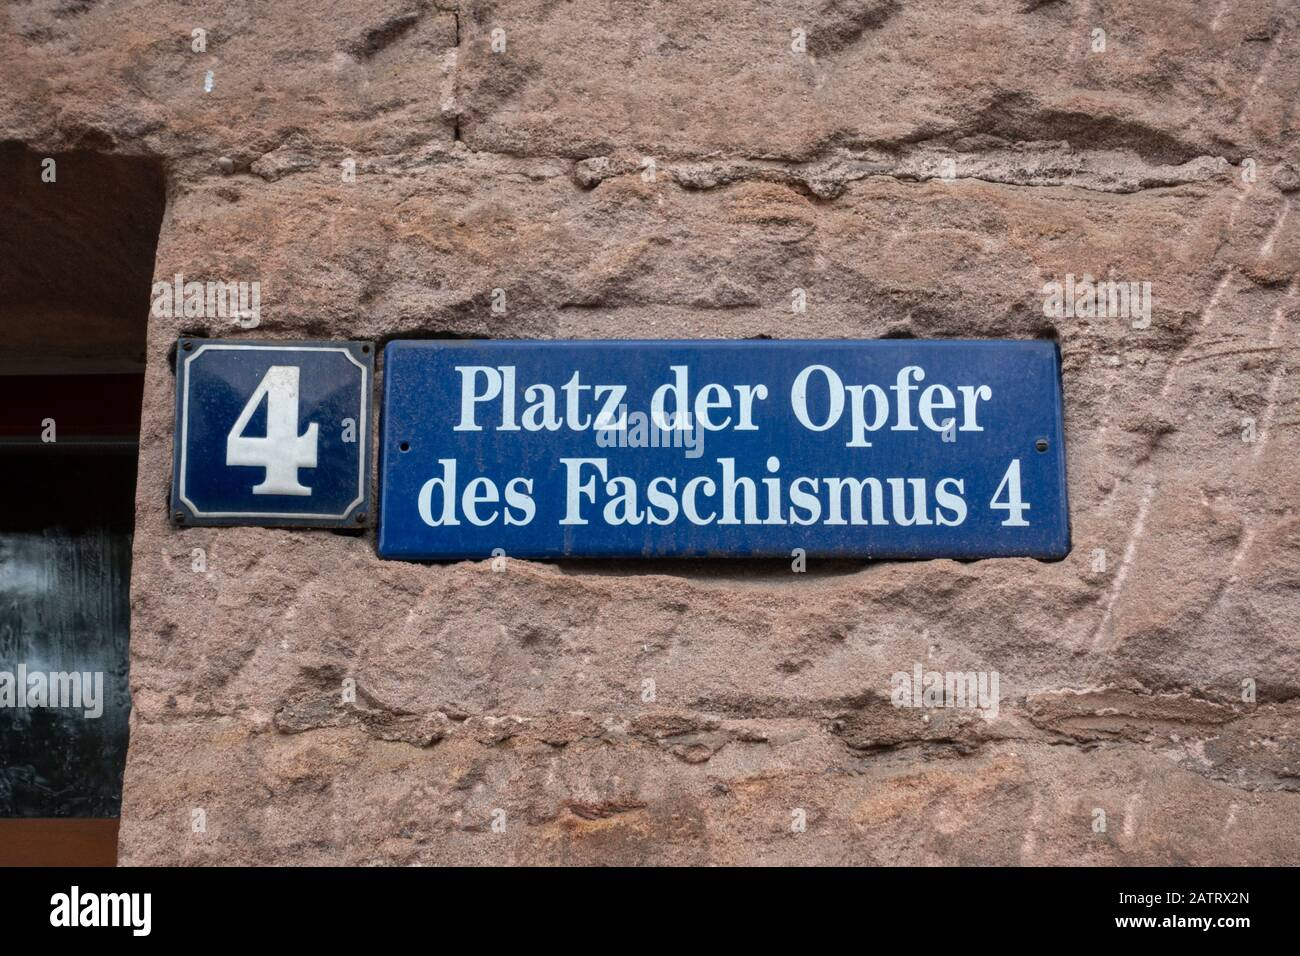 Street sign for Platz der Opfer des Faschismus (Place of Victims of Fascism) in Nuremberg, Bavaria, Germany. Stock Photo